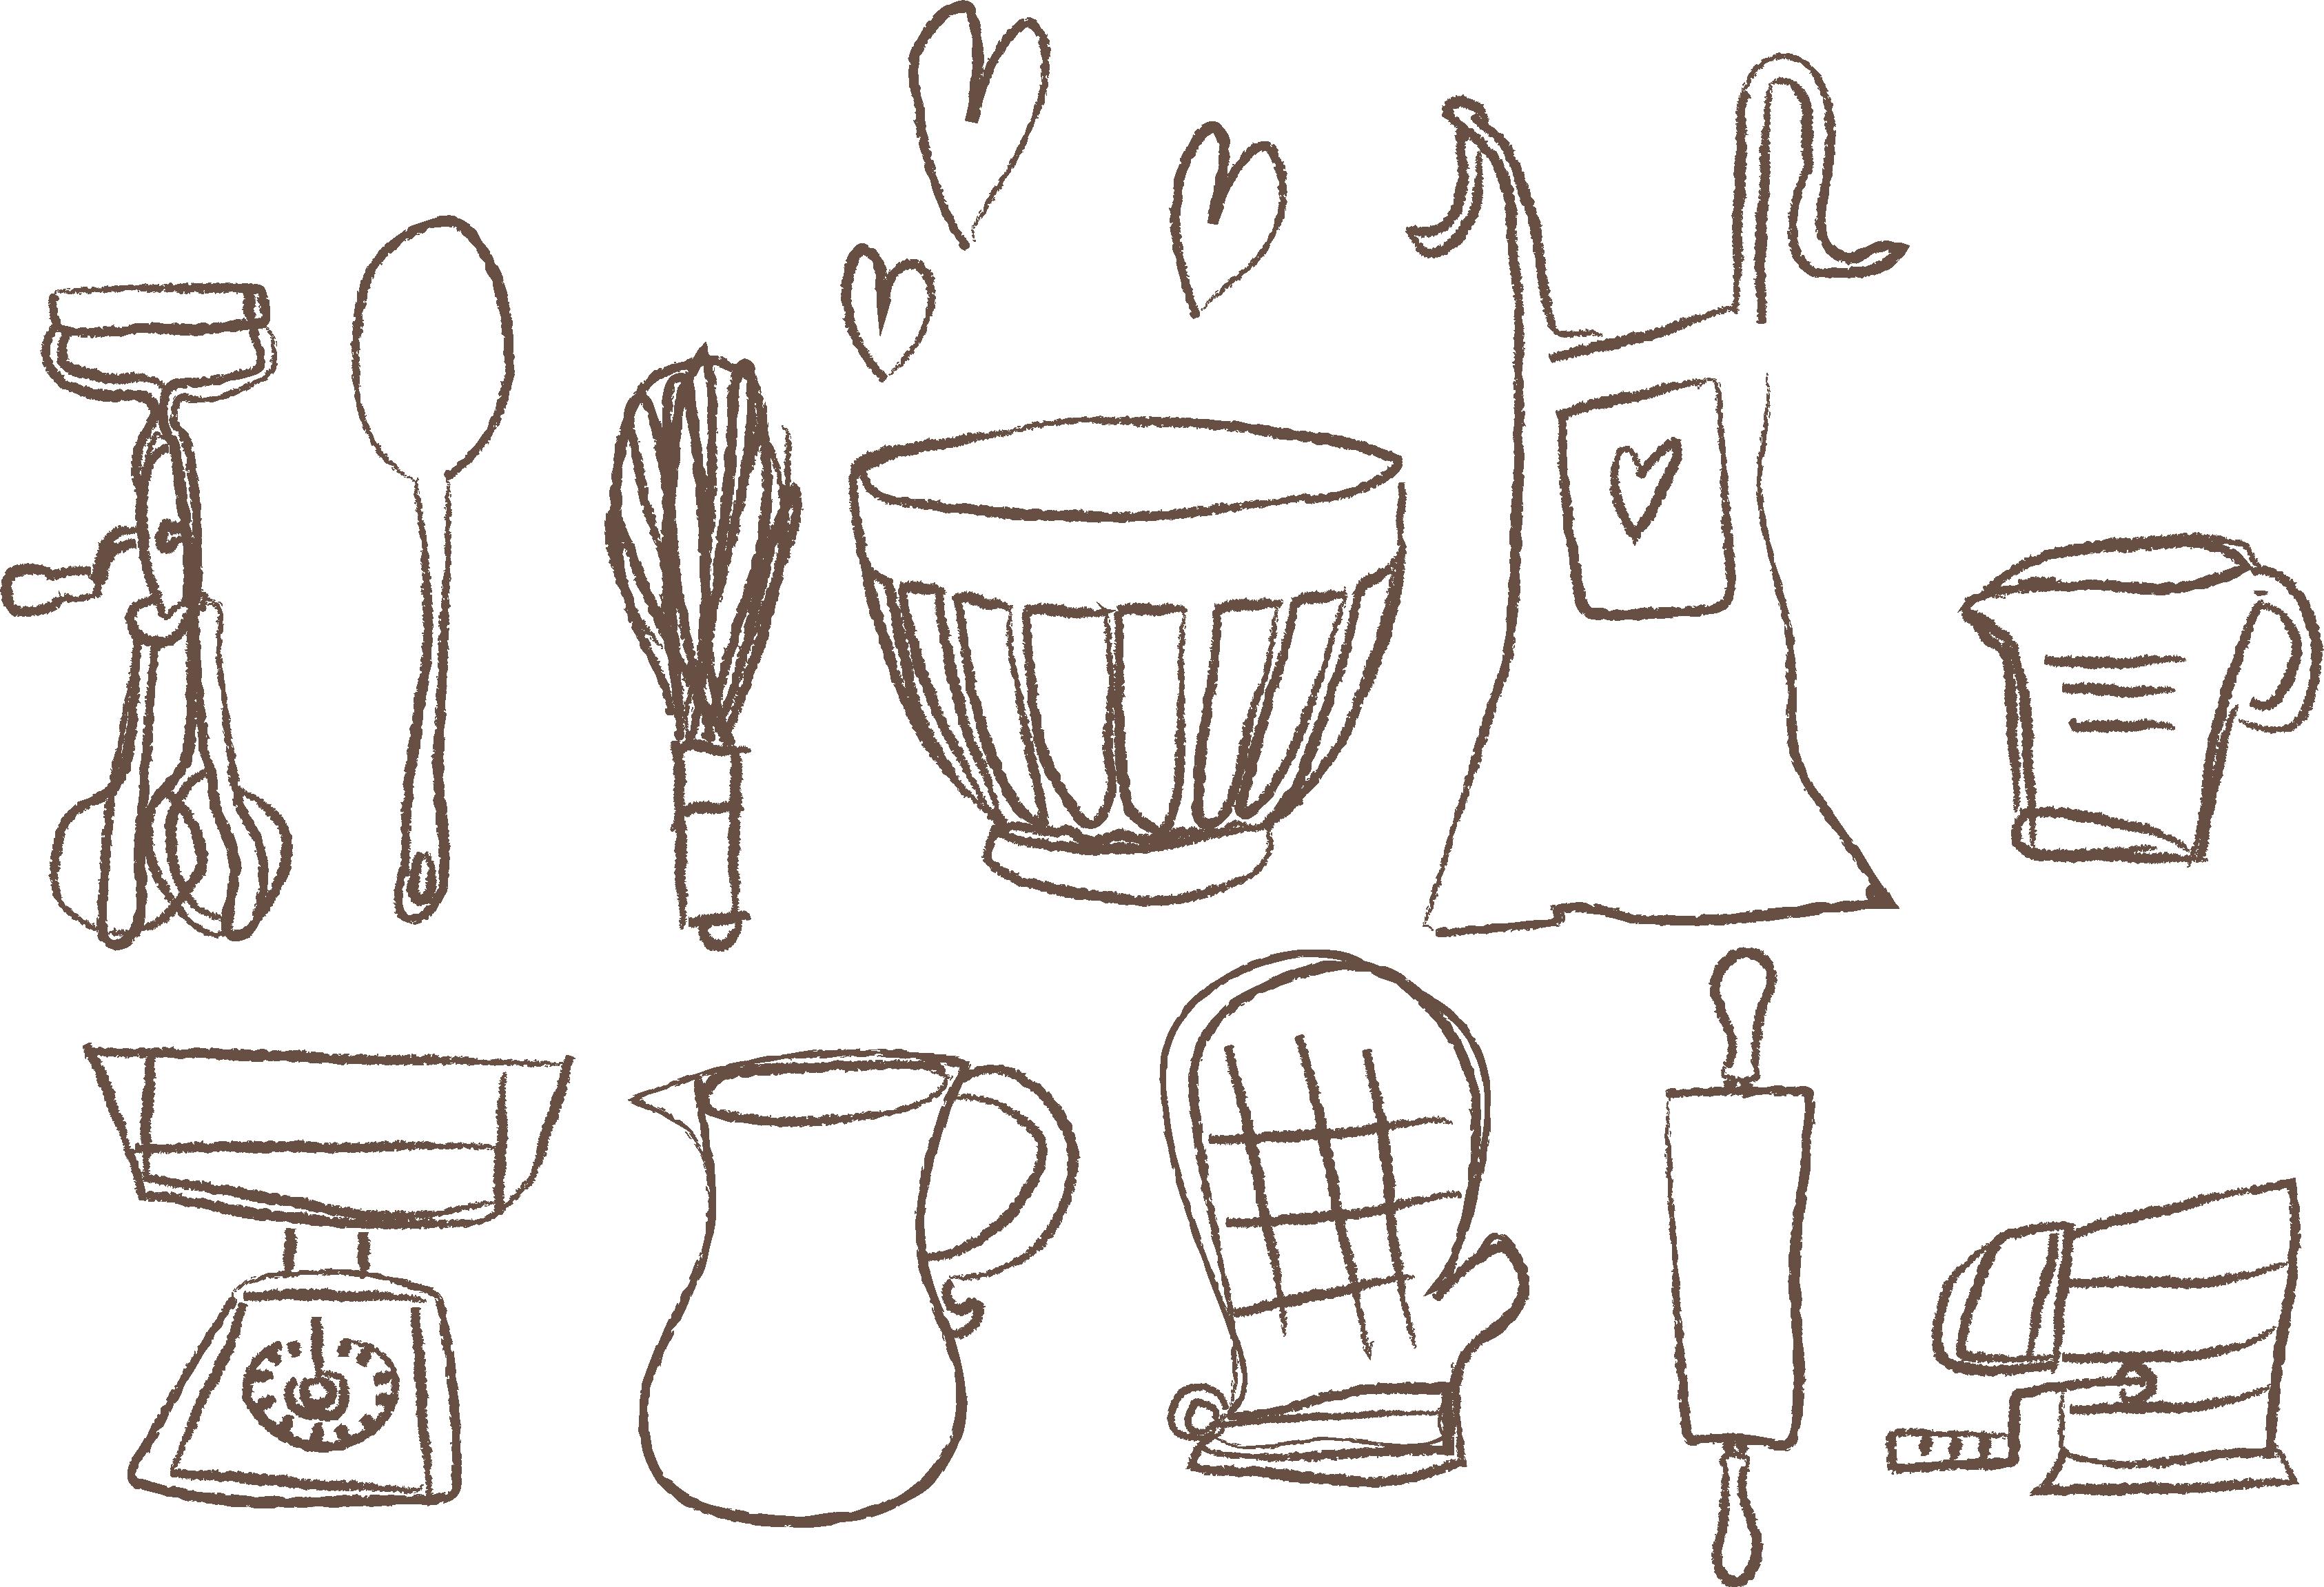 png freeuse Sweet sydneys monella designs. Baking drawing kitchen